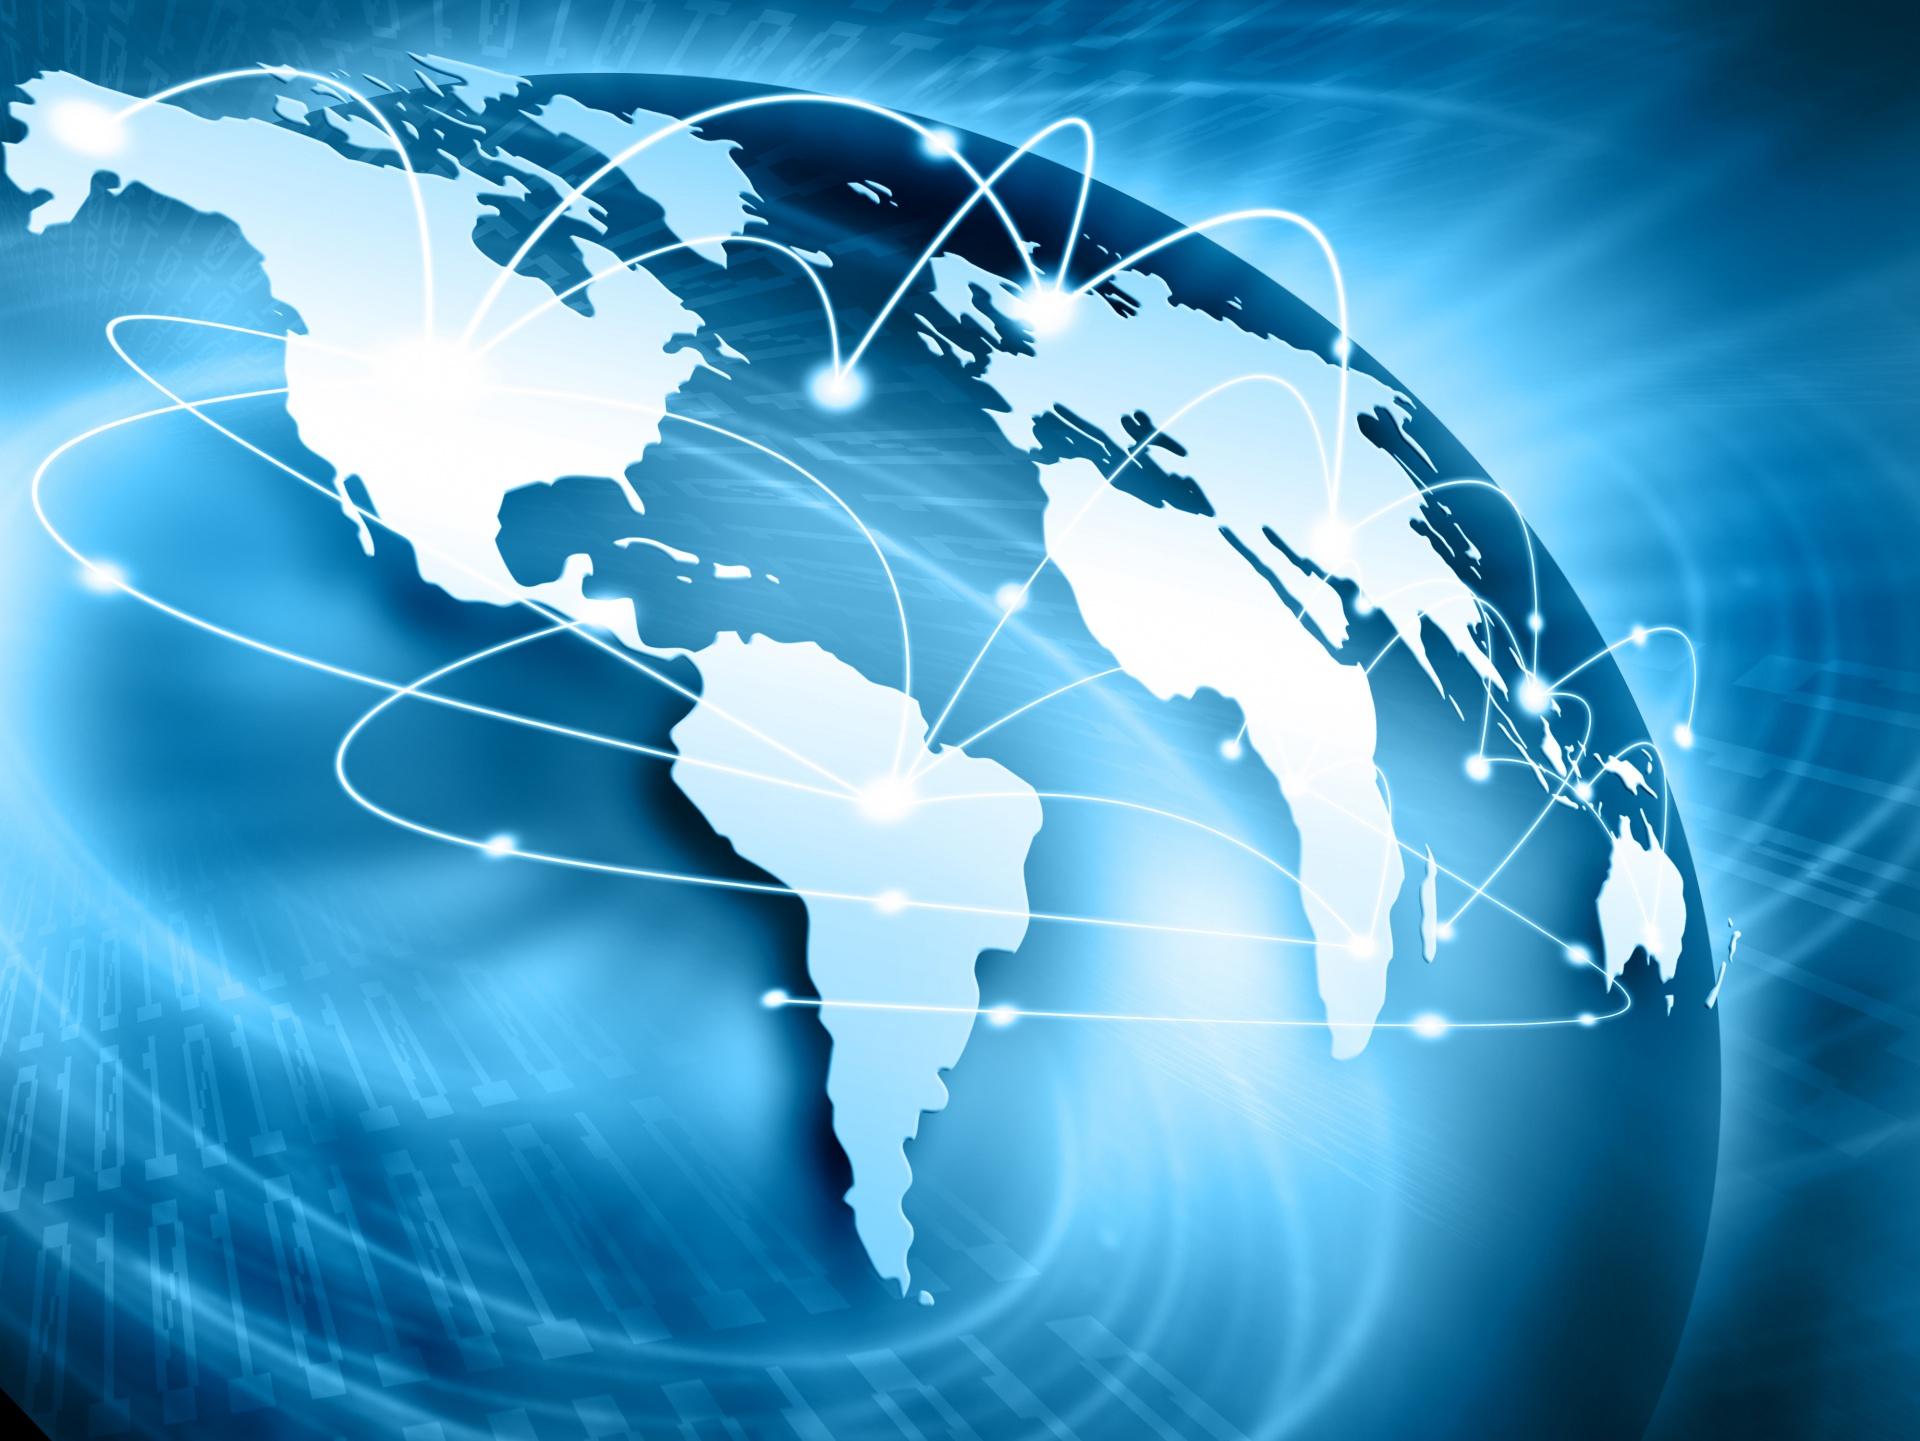 International shipbrokers and valuers - Eggar